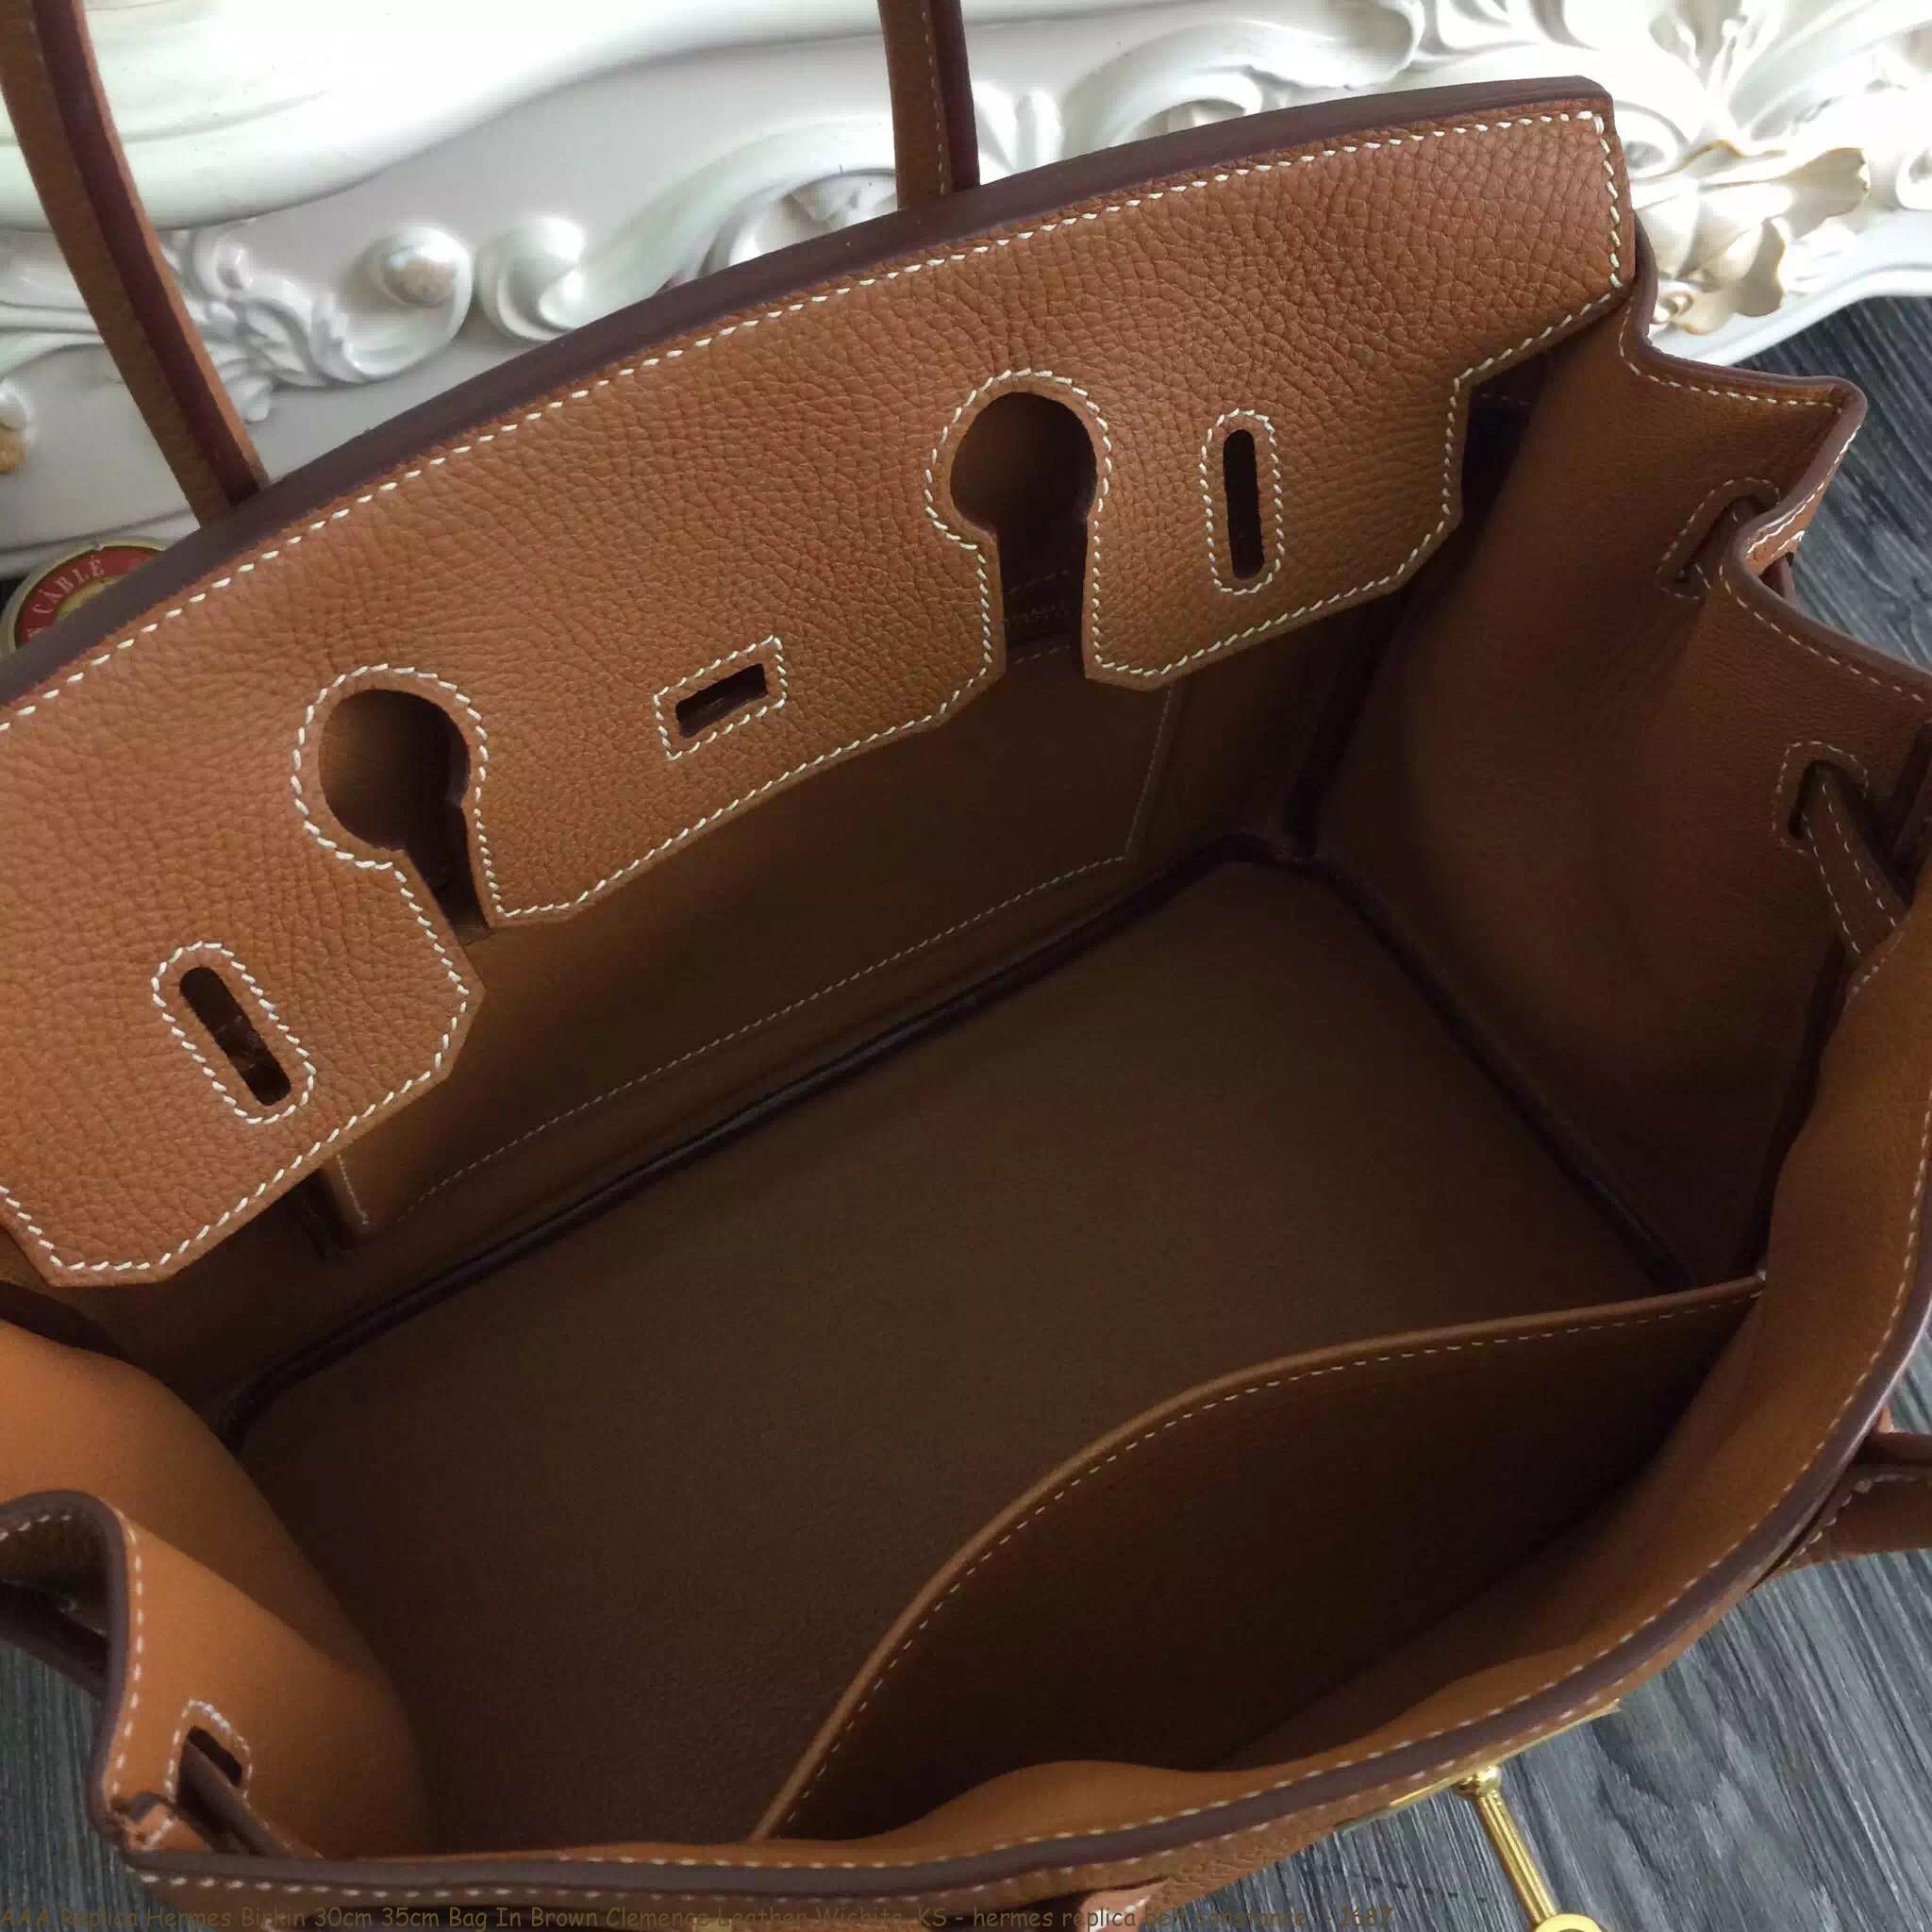 8a094e2cfeb AAA Replica Hermes Birkin 30cm 35cm Bag In Brown Clemence Leather ...